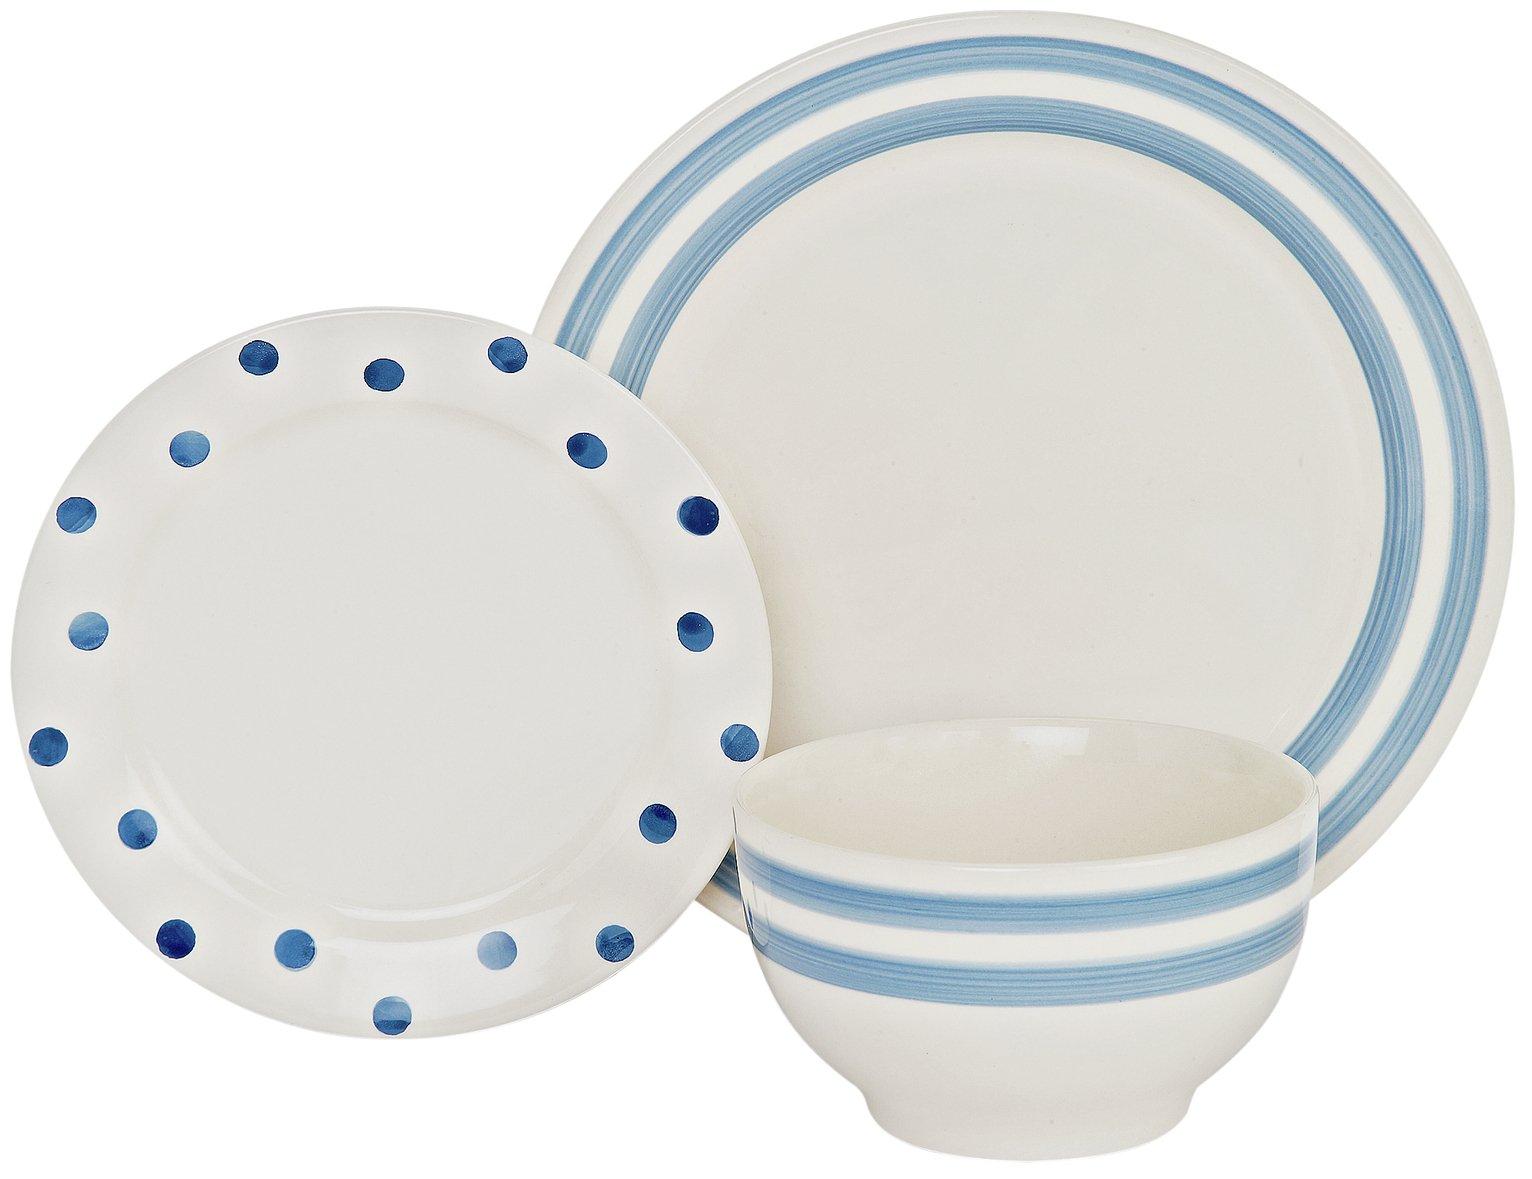 HOME - 12 Piece Country Stripes Dinner Set - Blue